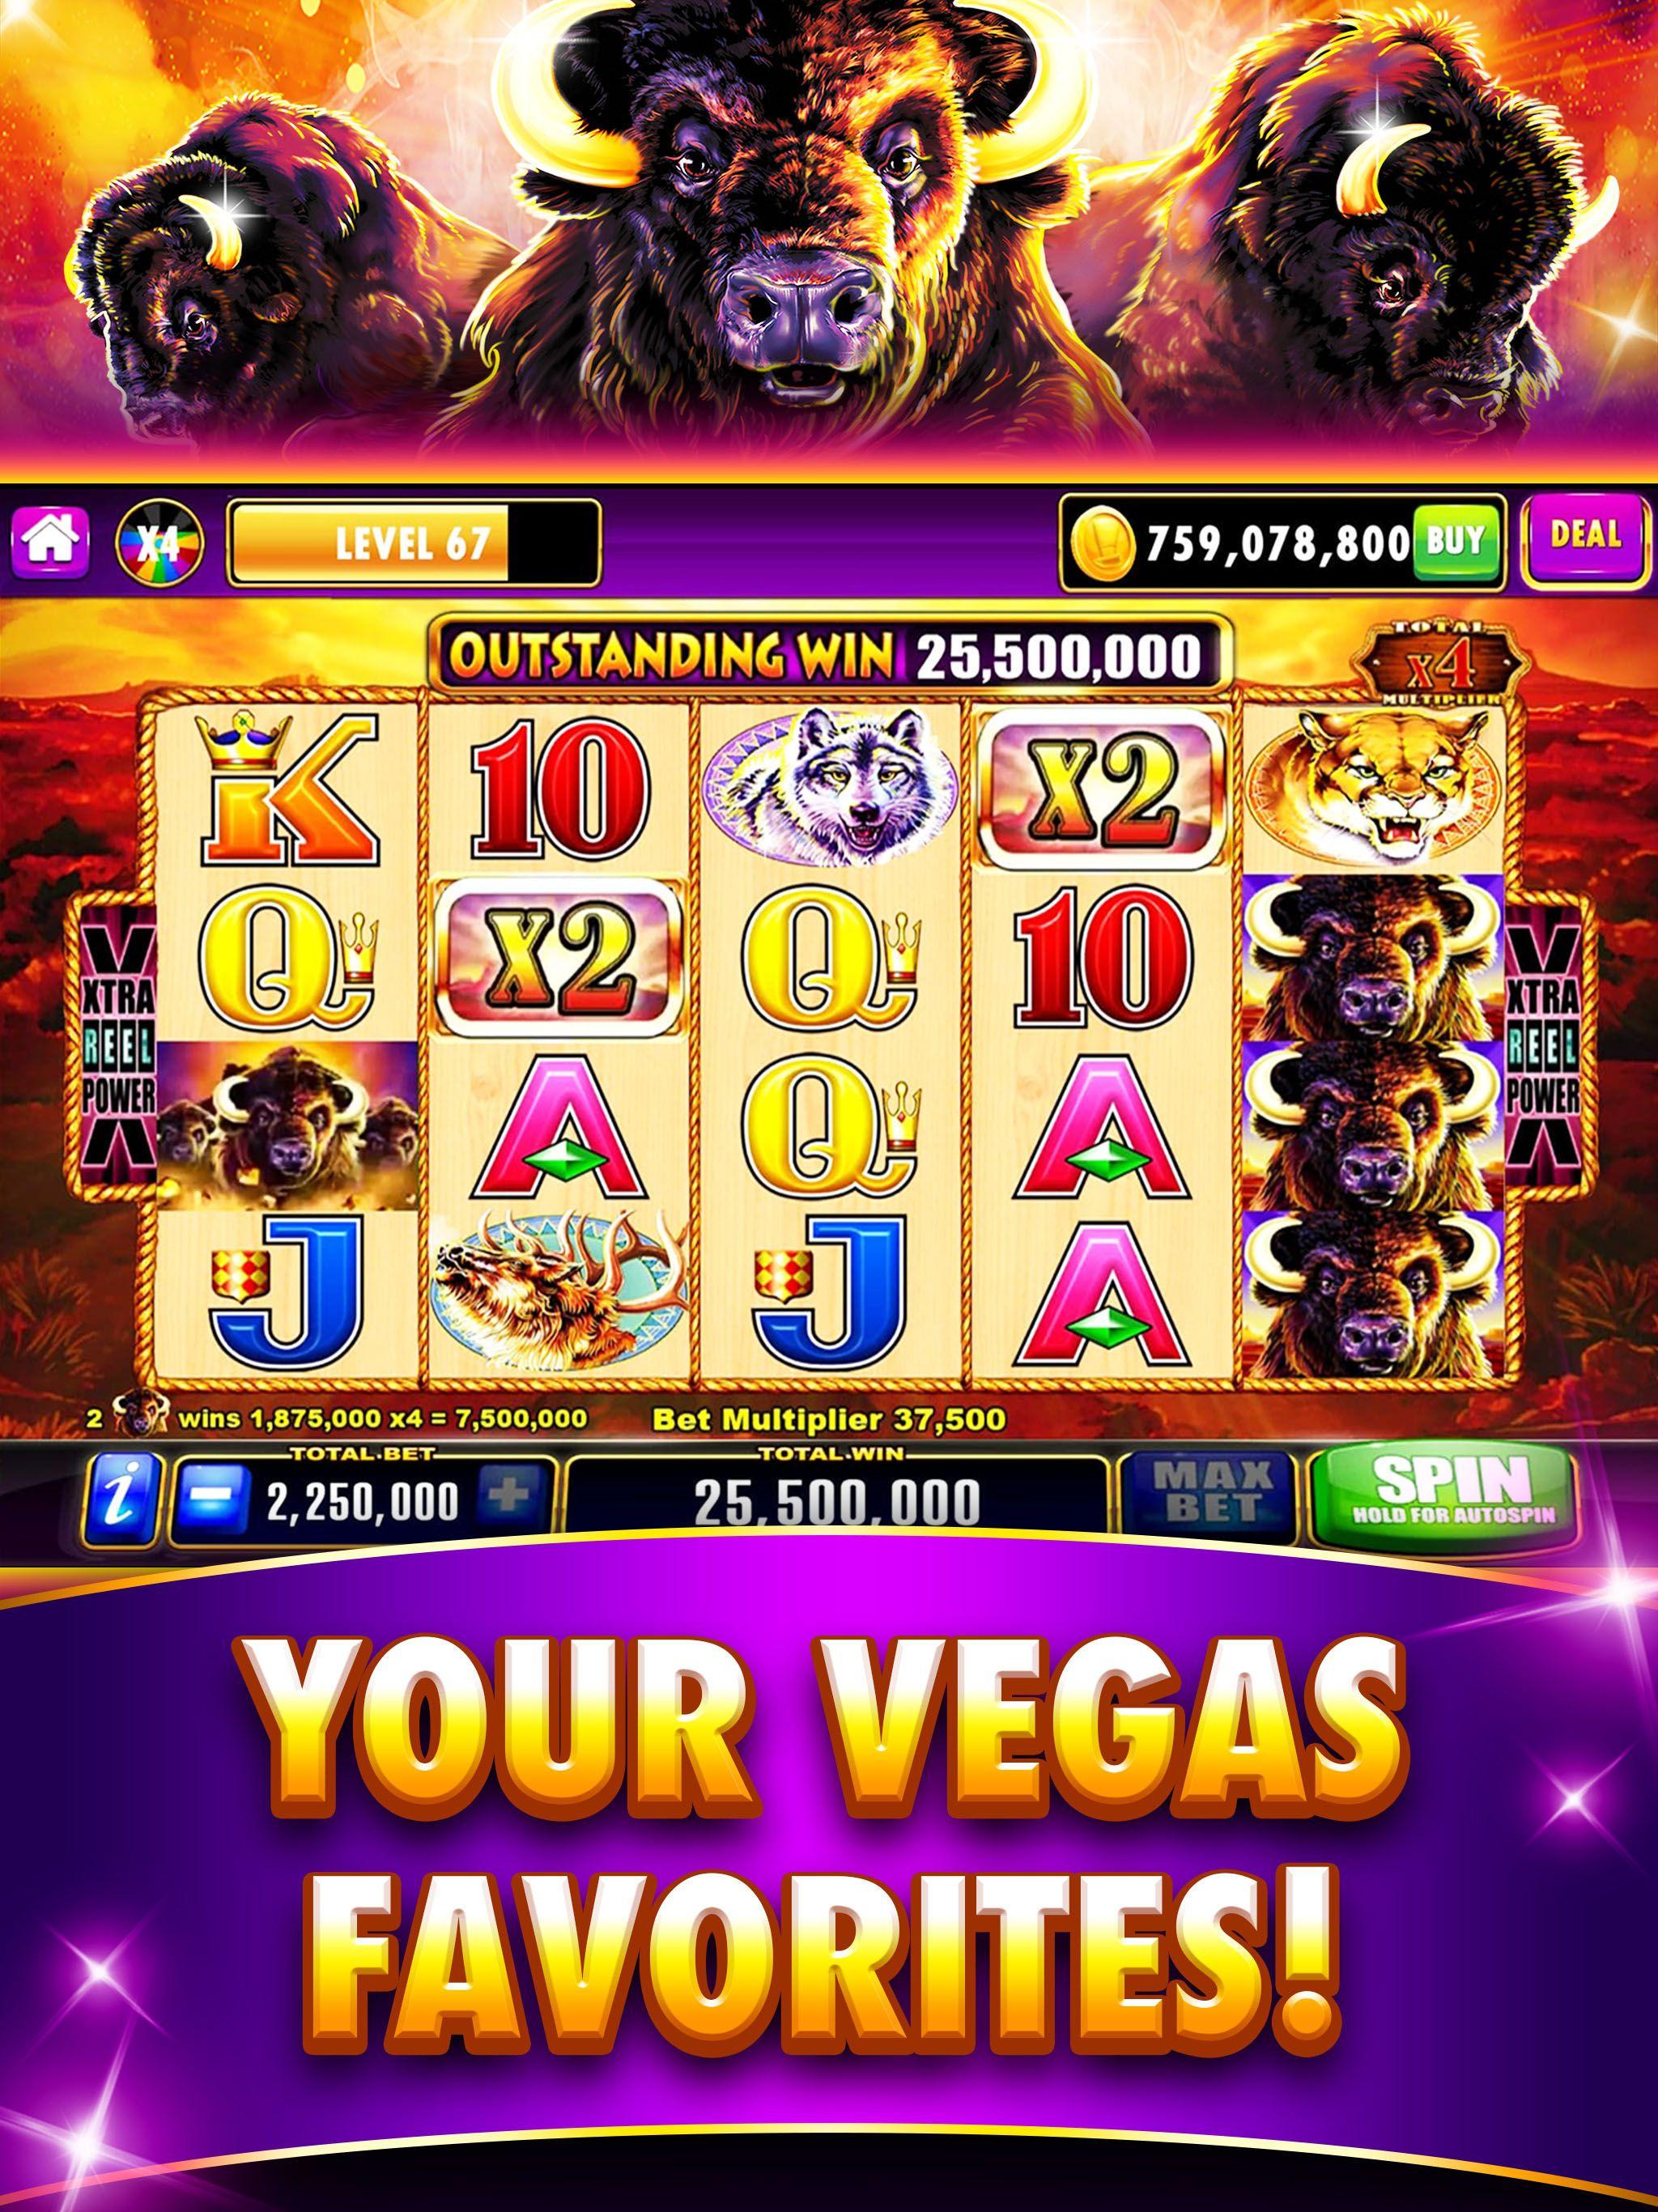 Cashman Casino Hack Tools No Verification Unlimited Coins Android Ios Cashman Casino Free Slots Casino Heart Of Vegas Bonus Casino